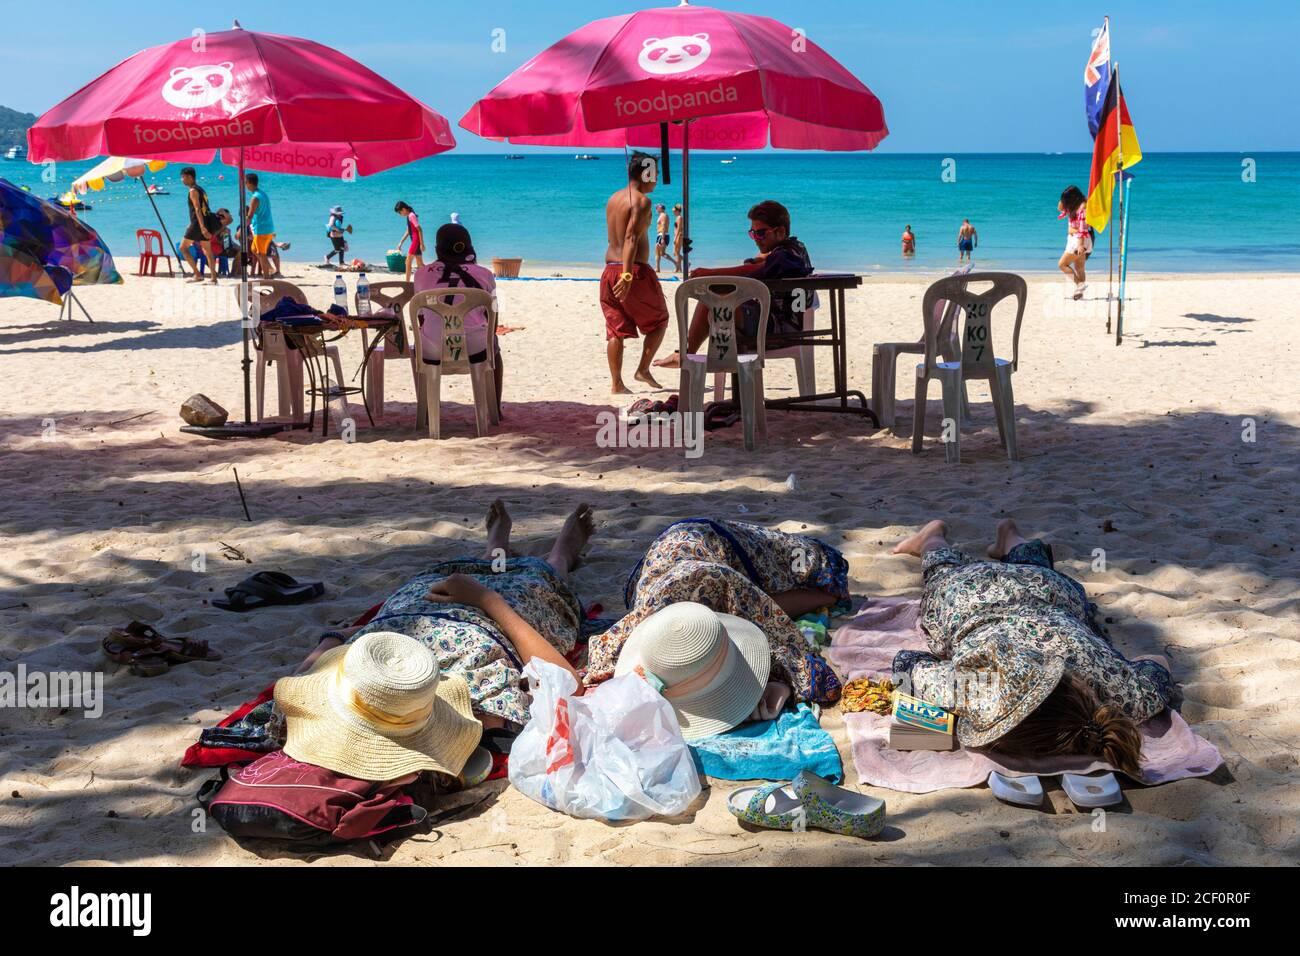 Touristen schlafen am Strand, Patong, Phuket, Thailand Stockfoto